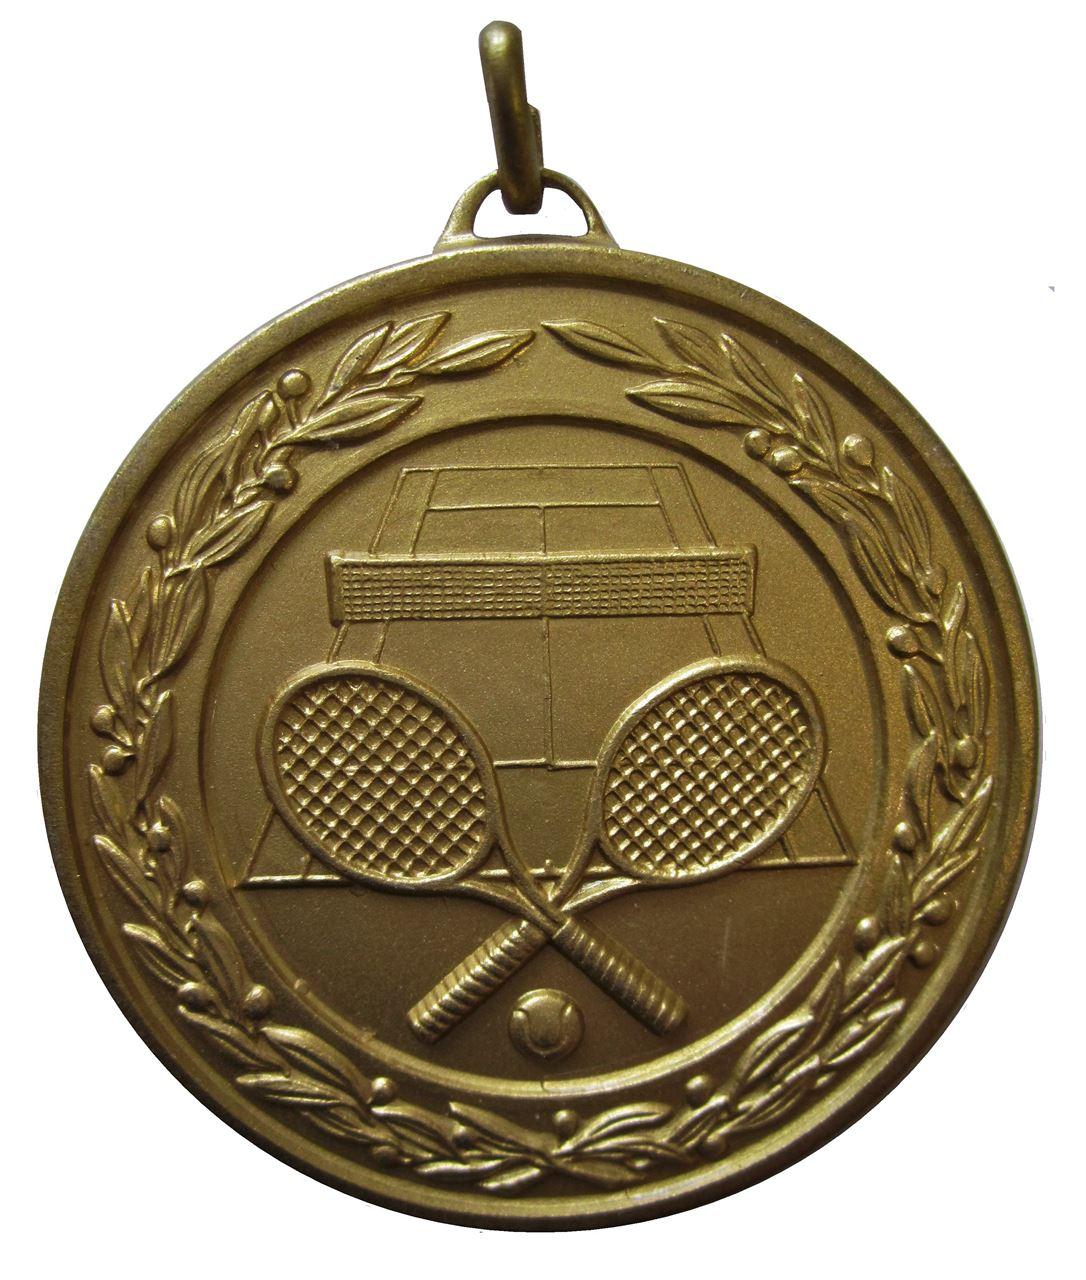 Bronze Laurel Economy Tennis Medal (size: 50mm) - 9621E